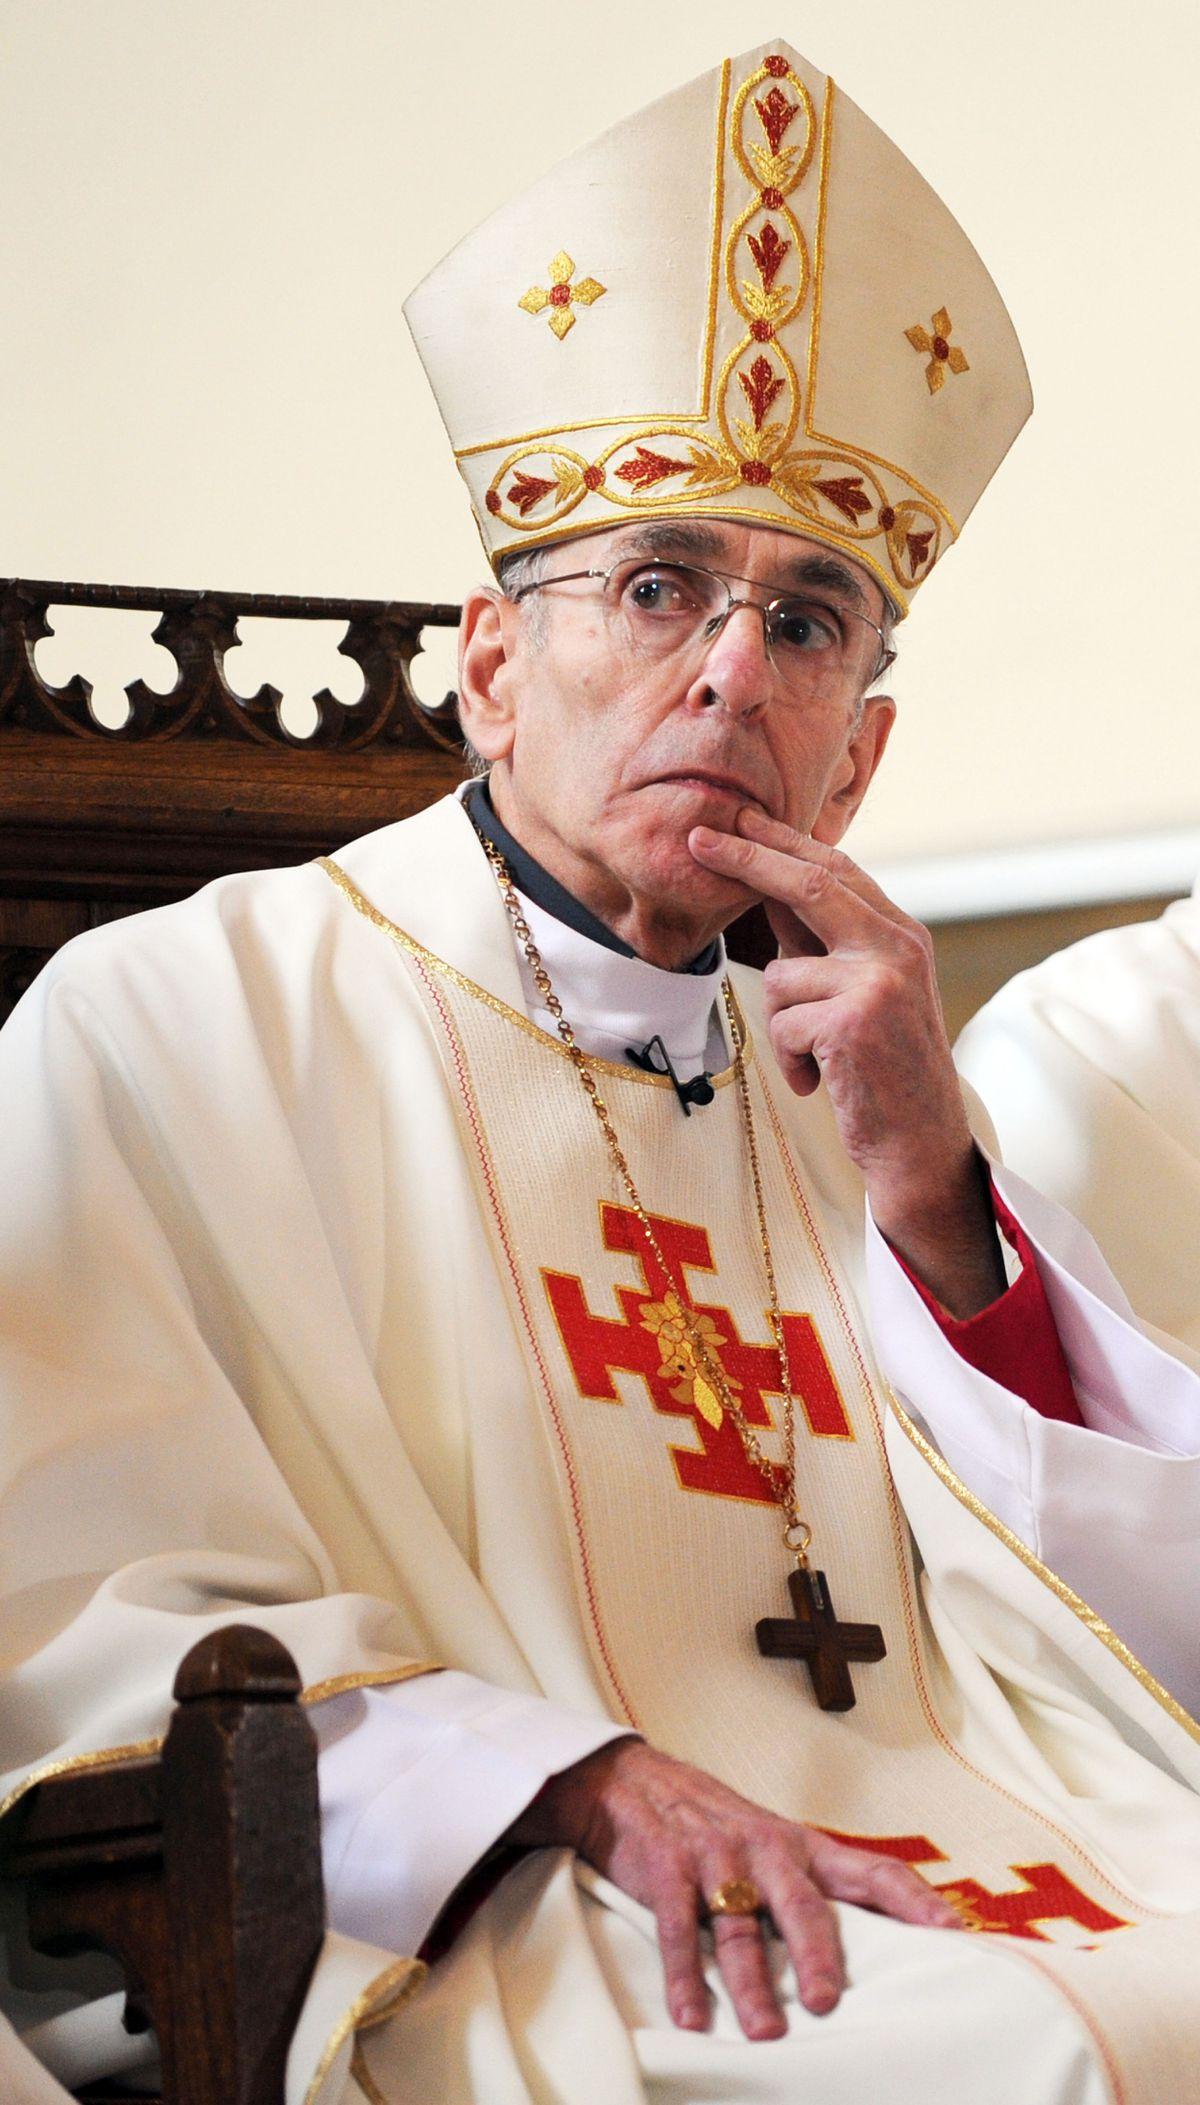 Bishop Brian Noble